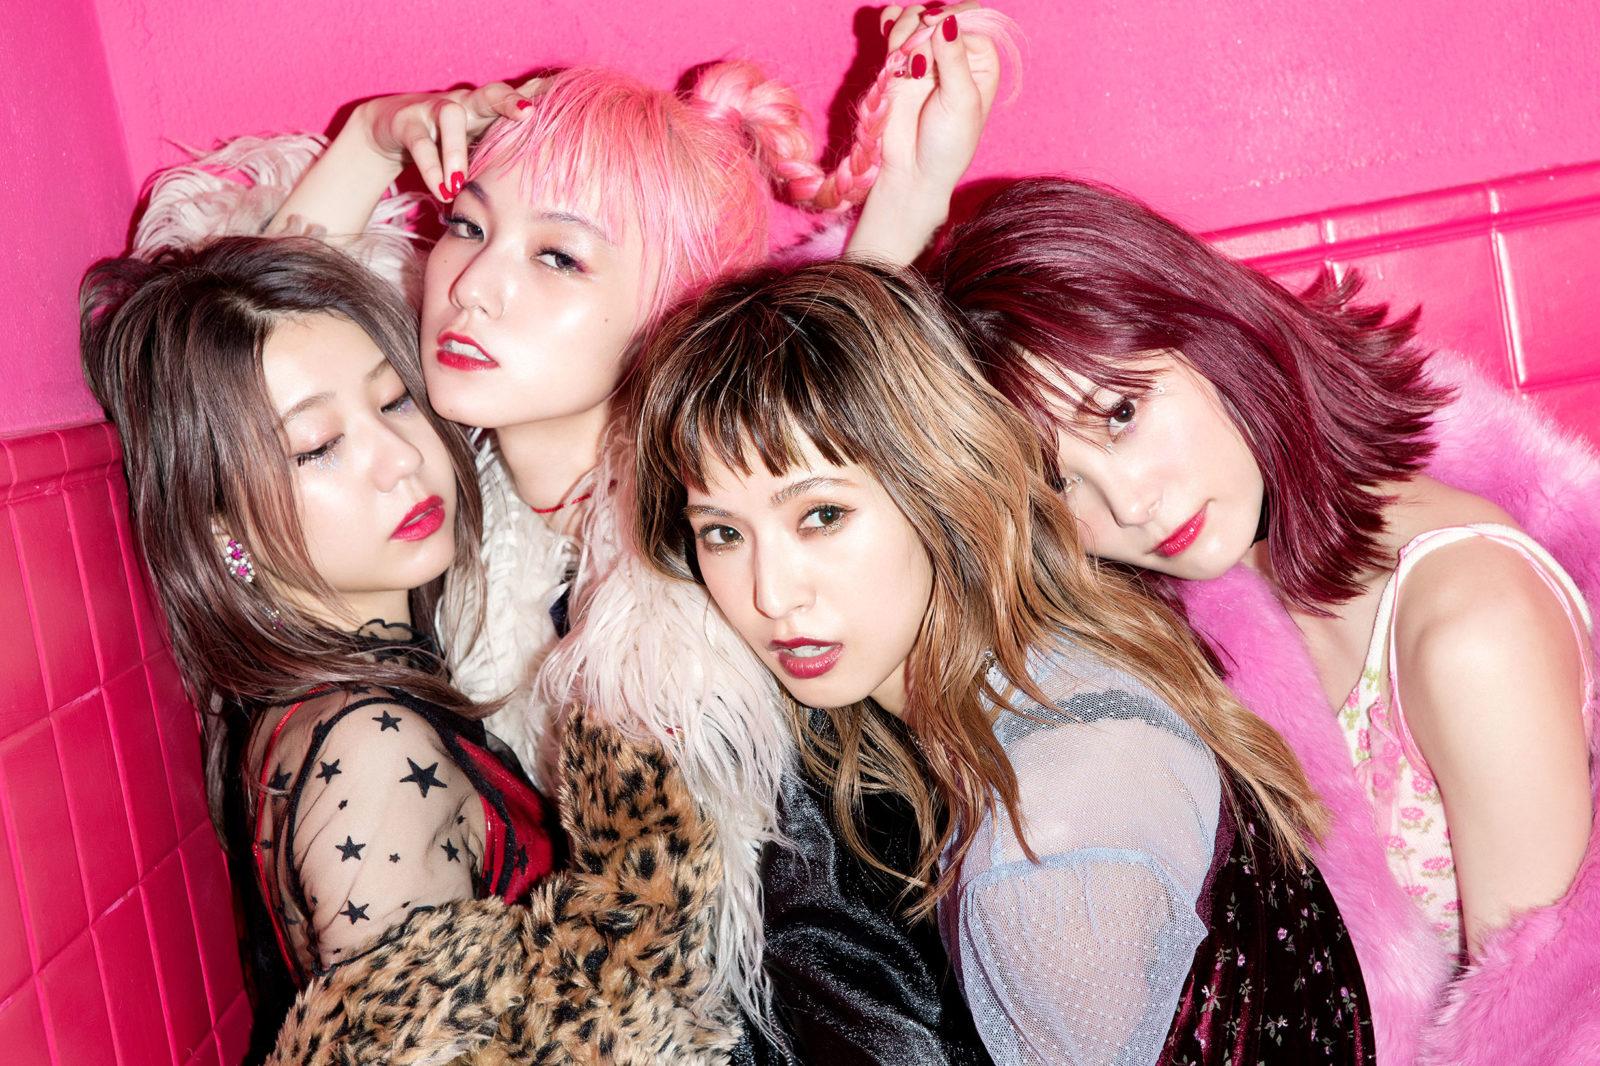 SCANDAL ニューアルバム「HONEY」収録曲「プラットホームシンドローム」のMVをGyao!で公開サムネイル画像